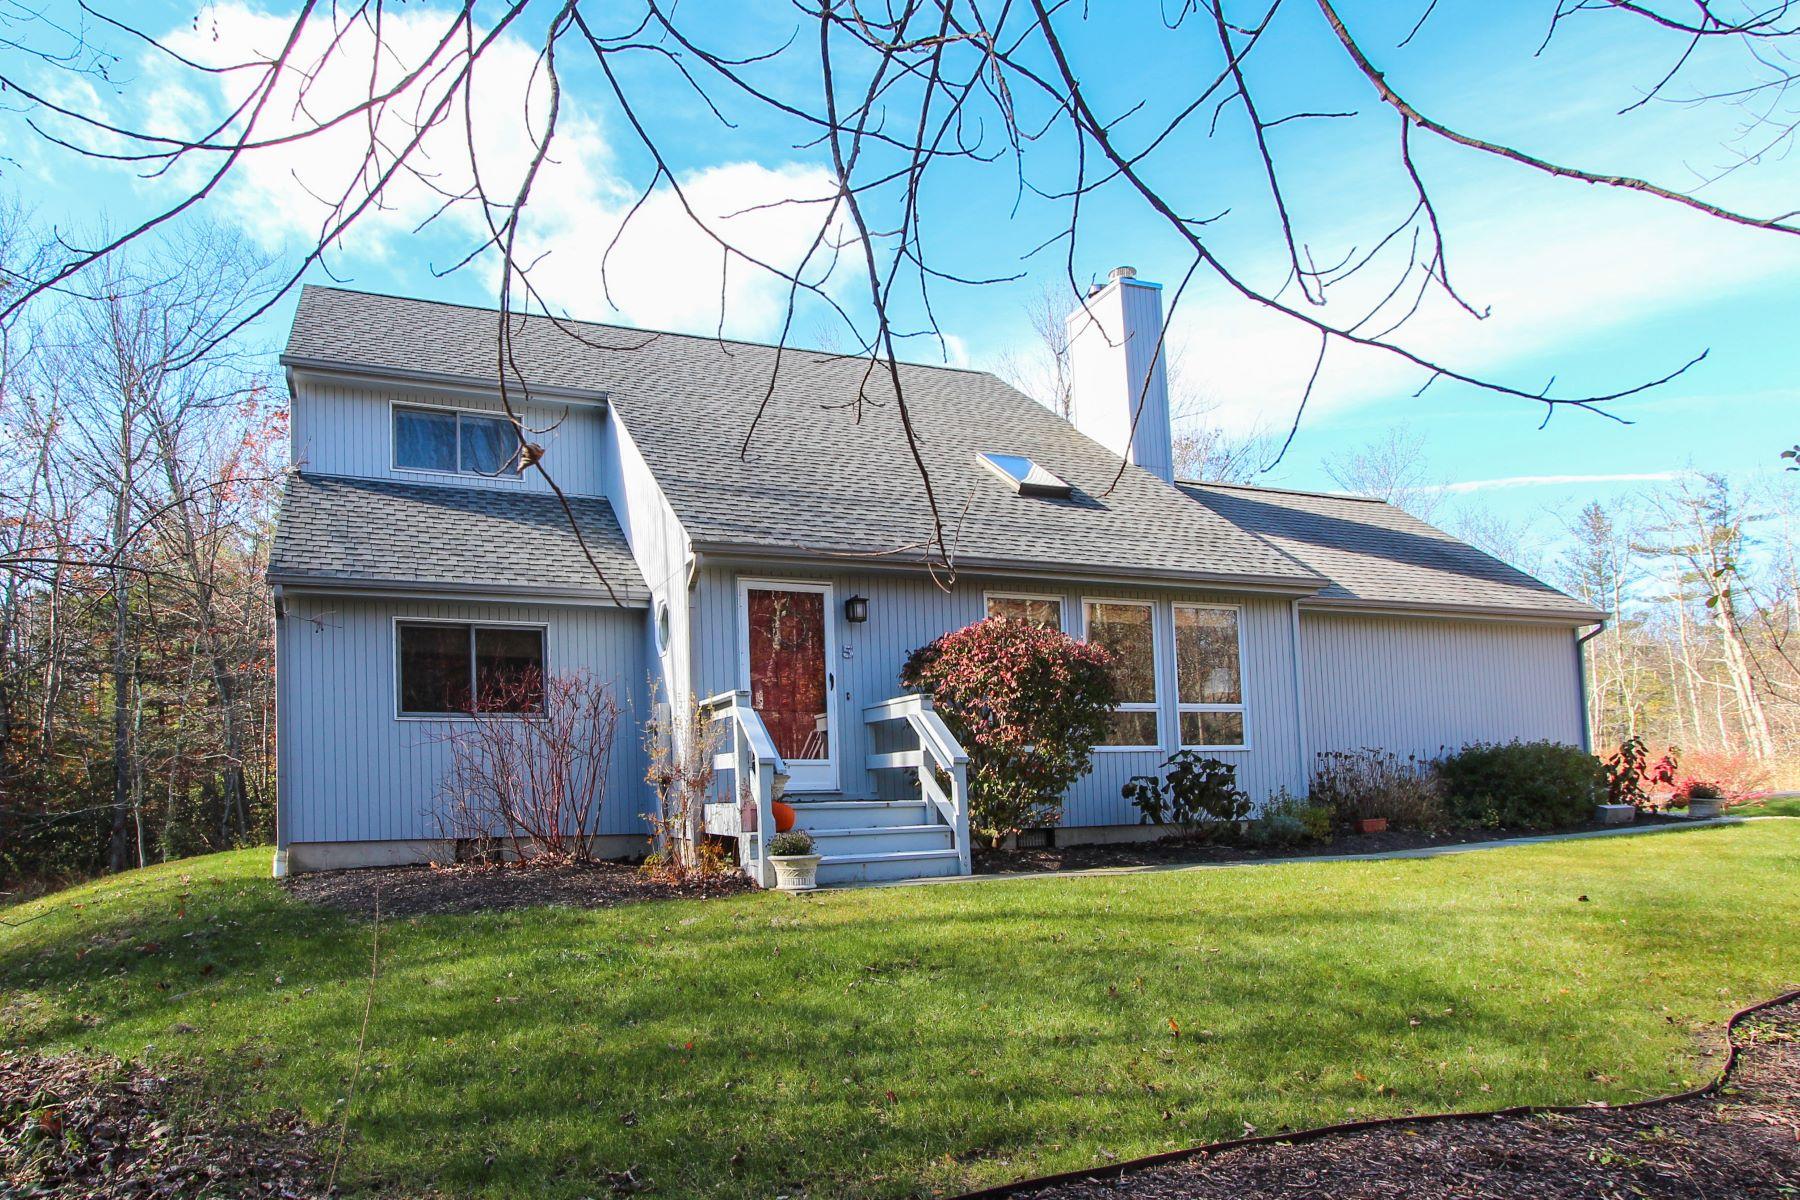 独户住宅 为 销售 在 Contemporary Cape At Woodridge Lake 5 Valcove Court, 哥珊地, 康涅狄格州, 06756 美国